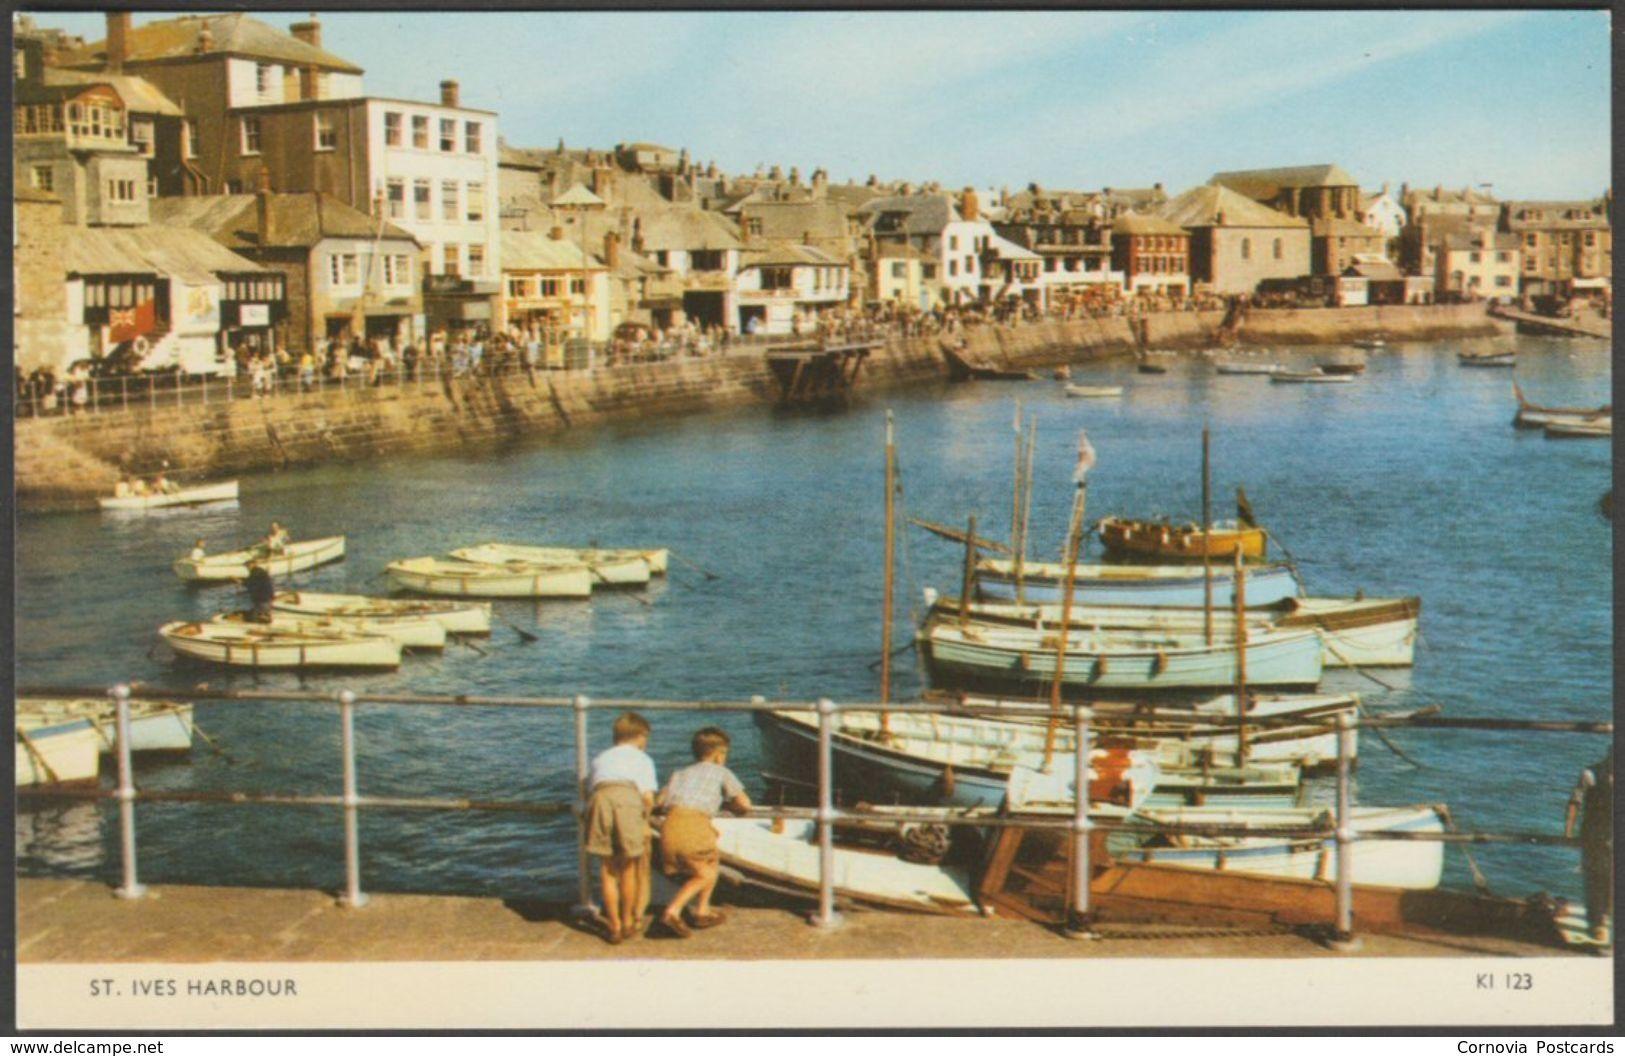 St Ives Harbour, Cornwall, c.1960s - Jarrold Postcard